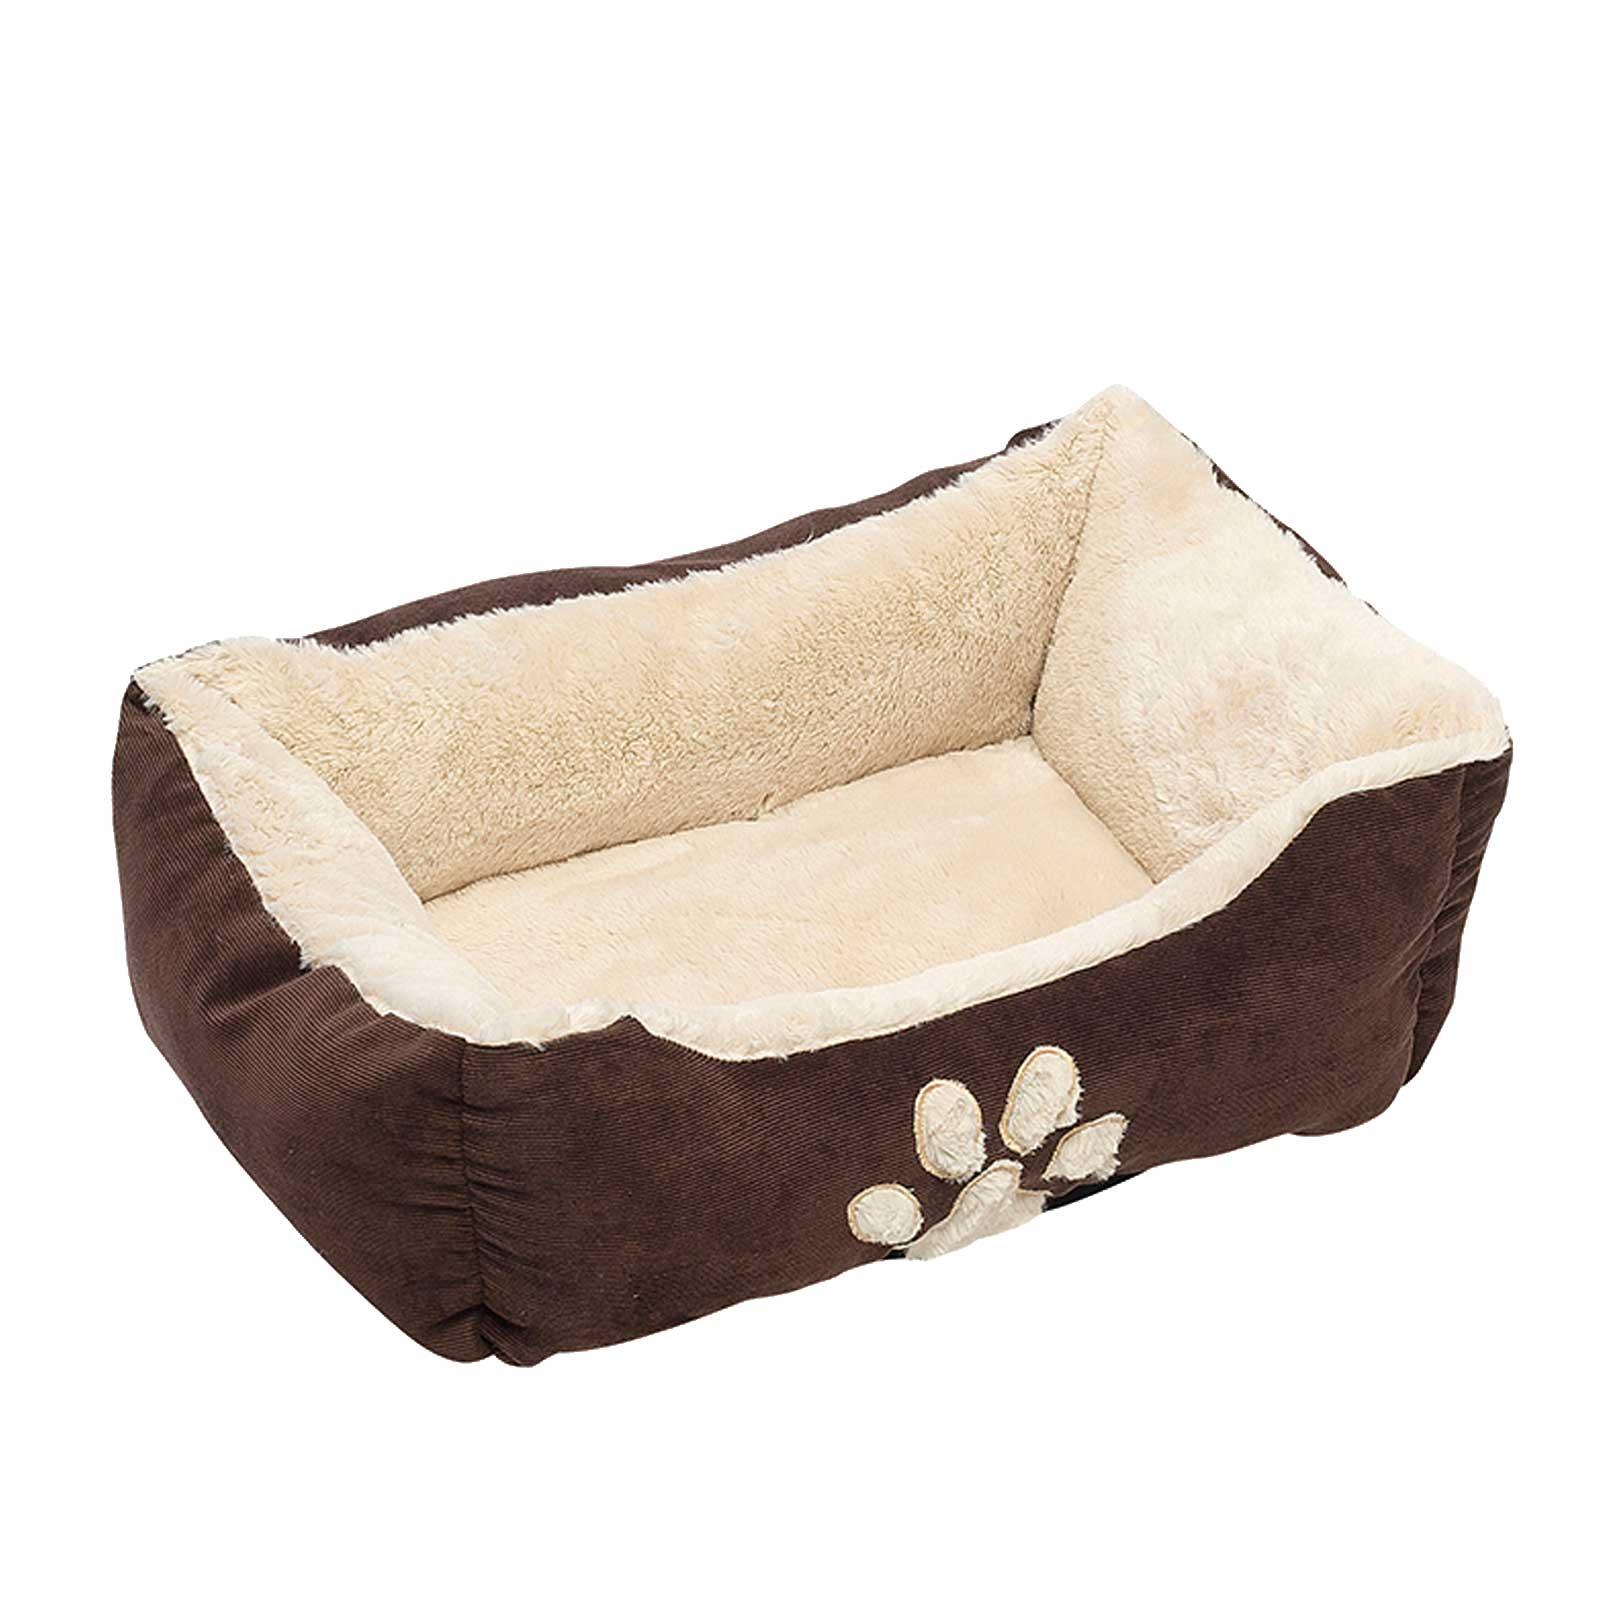 Hunde Luxus Kissen Hundebett 47 x 37 x 17 cm, Braun